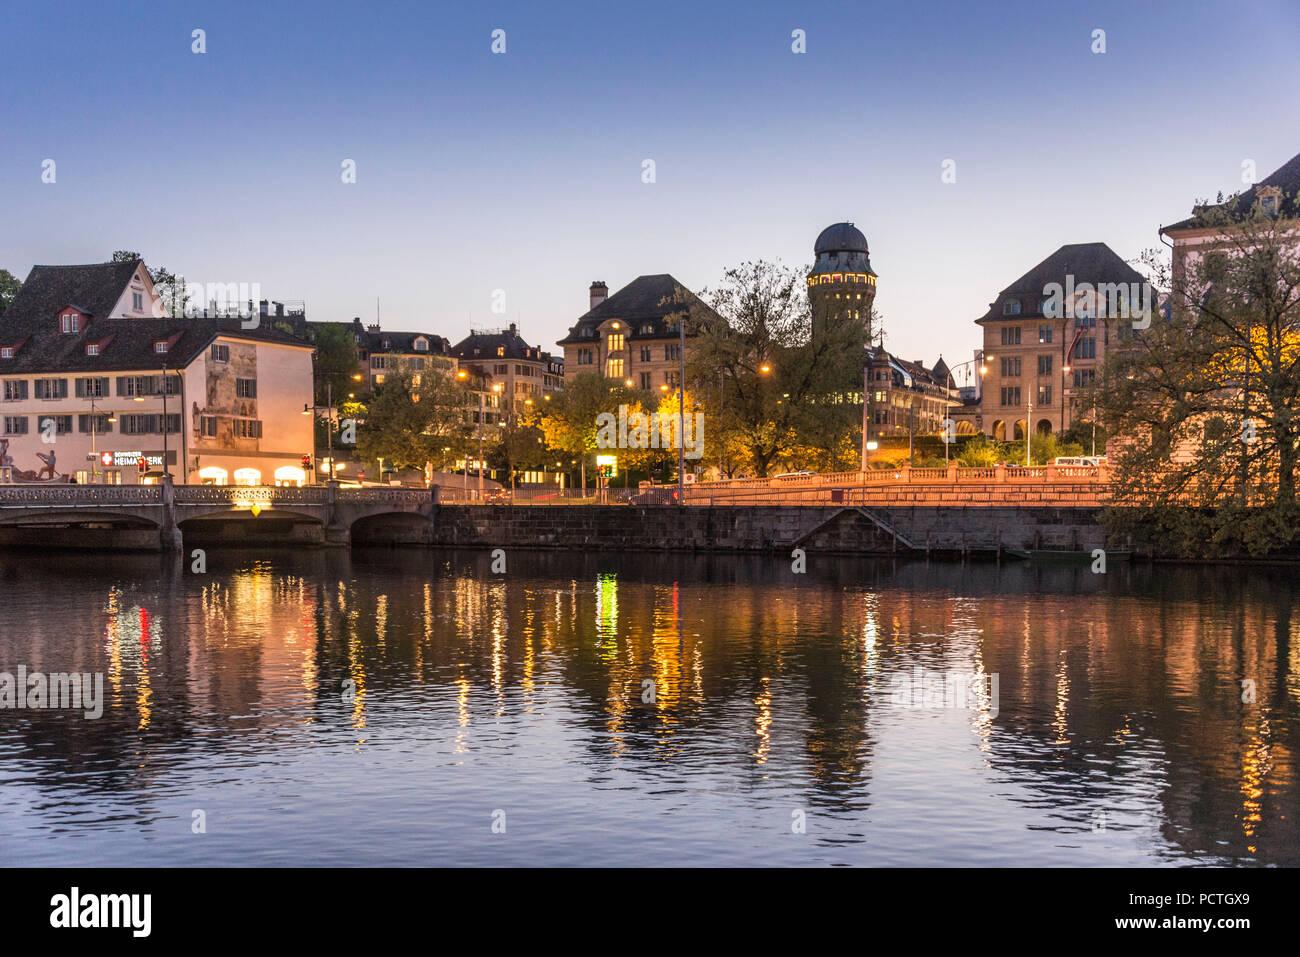 Evening mood at the Limmatquai, old town, Zurich, Canton of Zurich, Switzerland - Stock Image